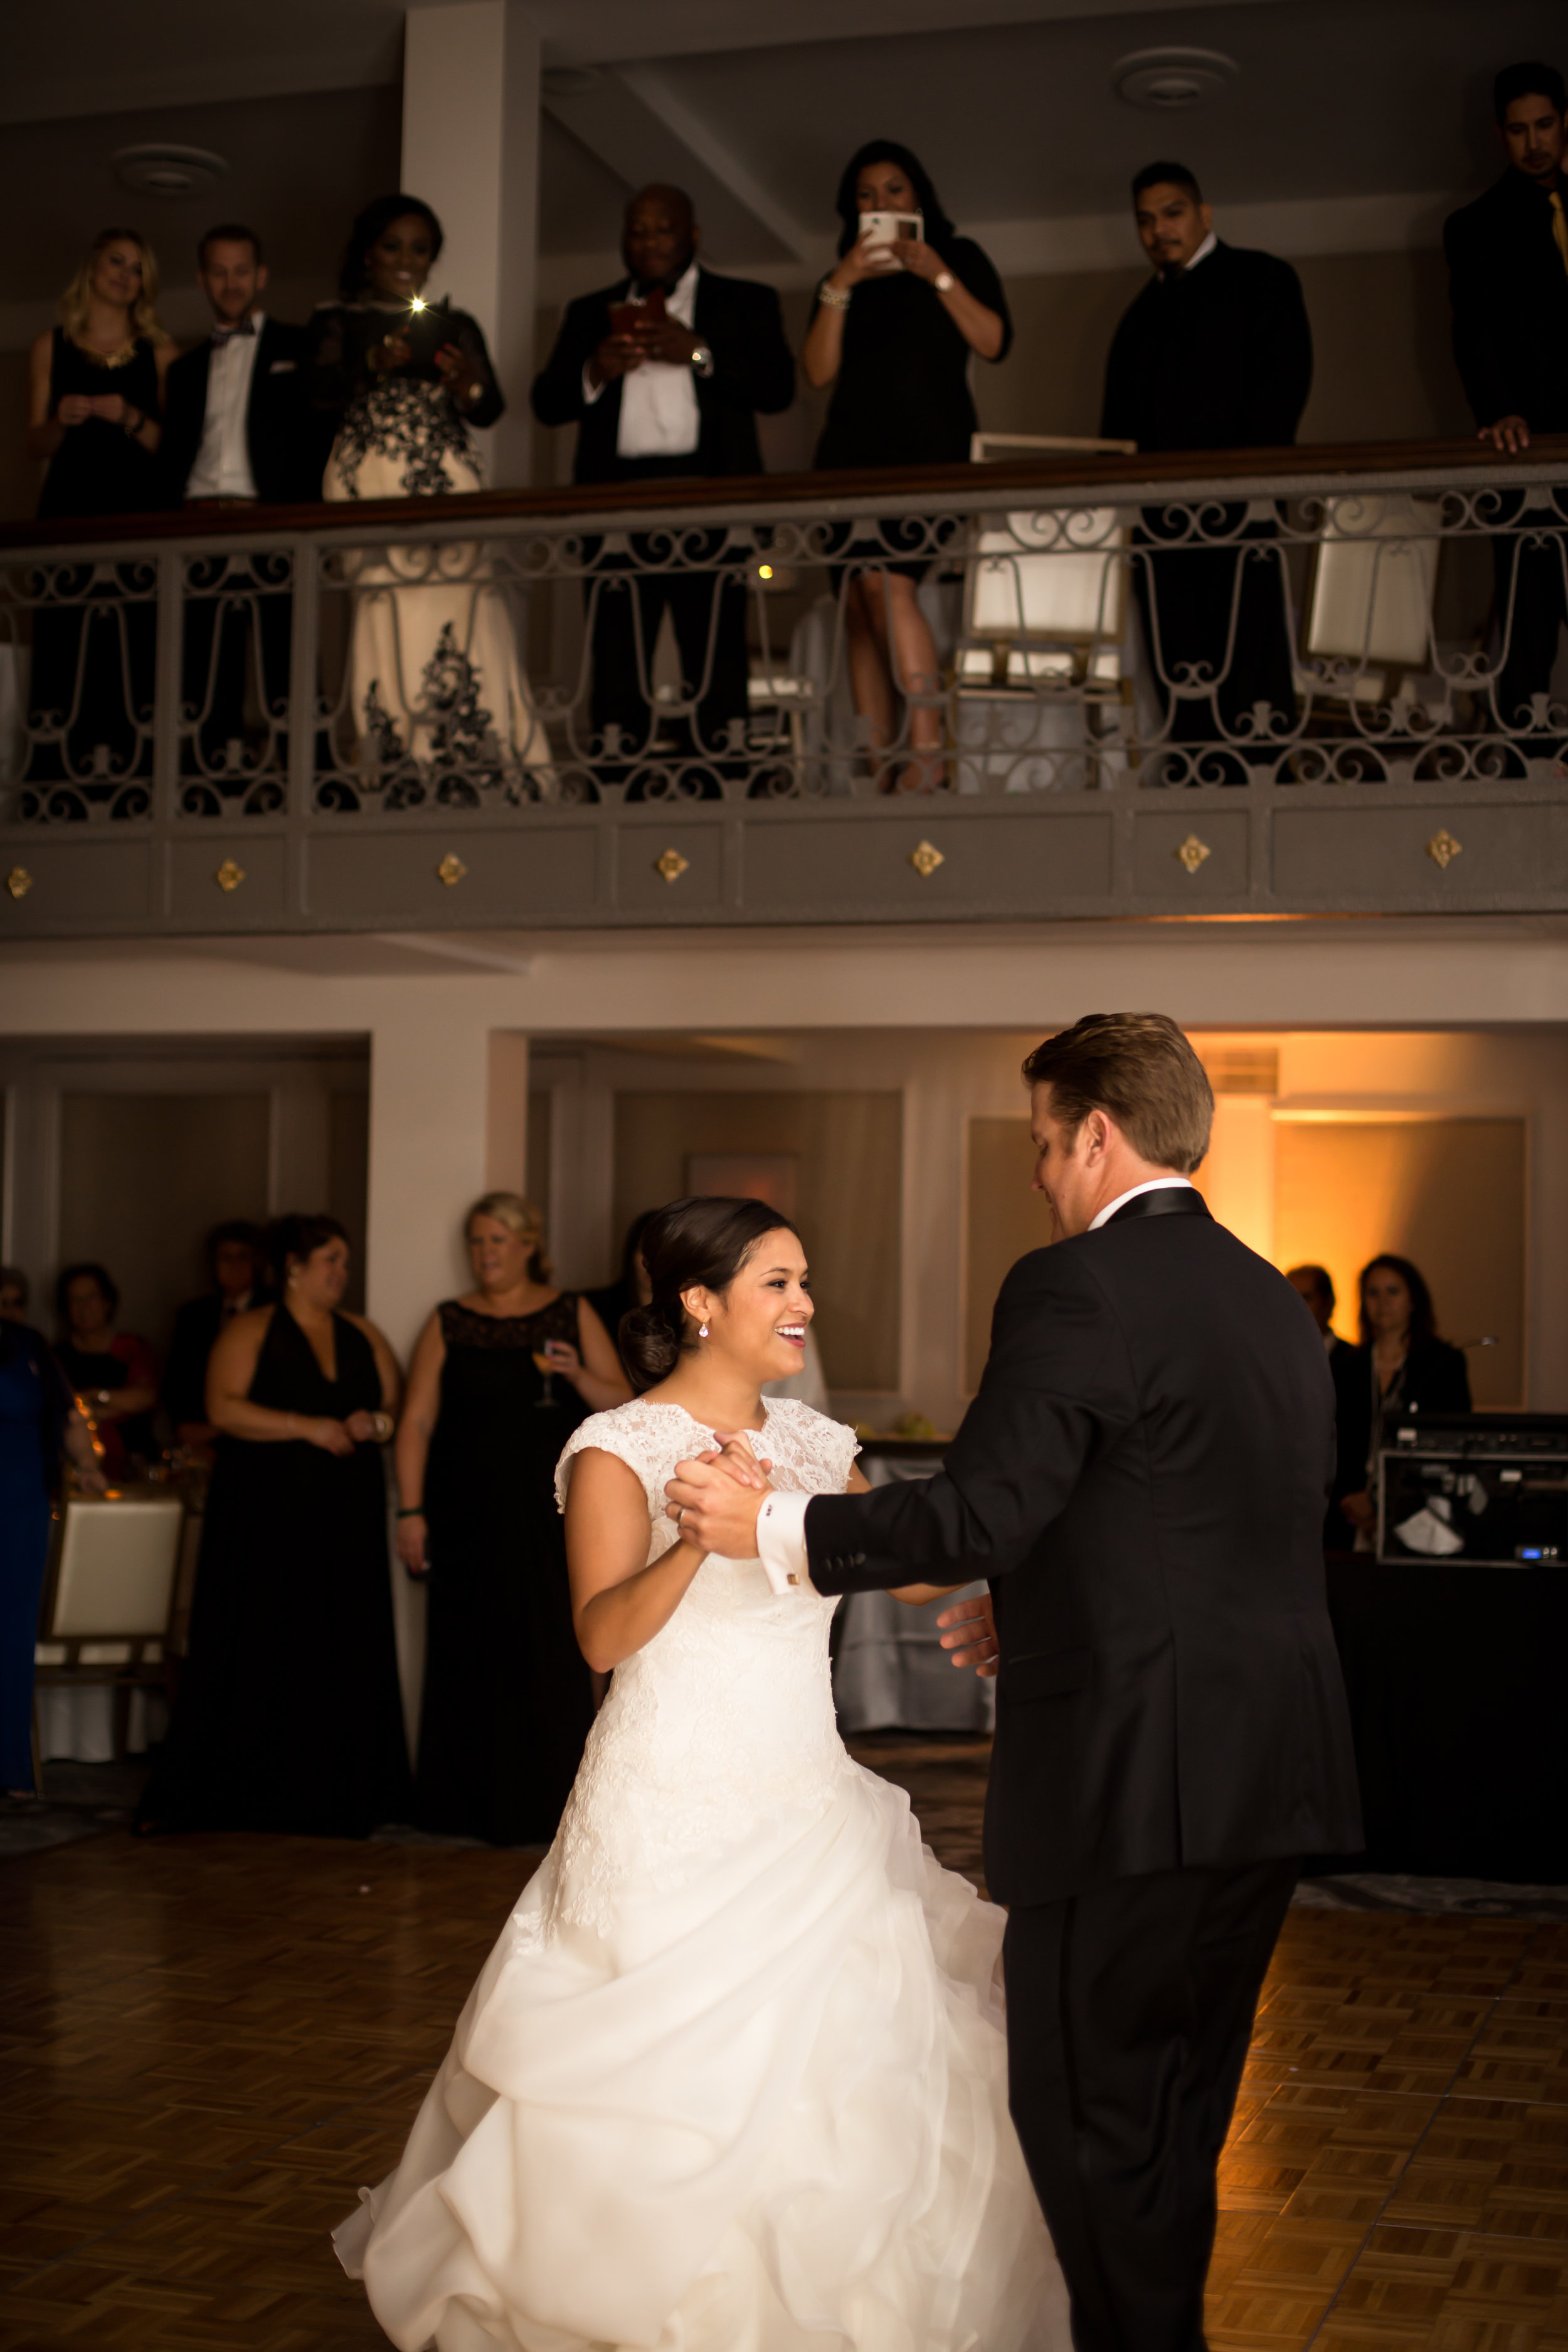 Marble_Falls_Horseshoe_Bay_Photographer_Torres_Wedding_43.jpg